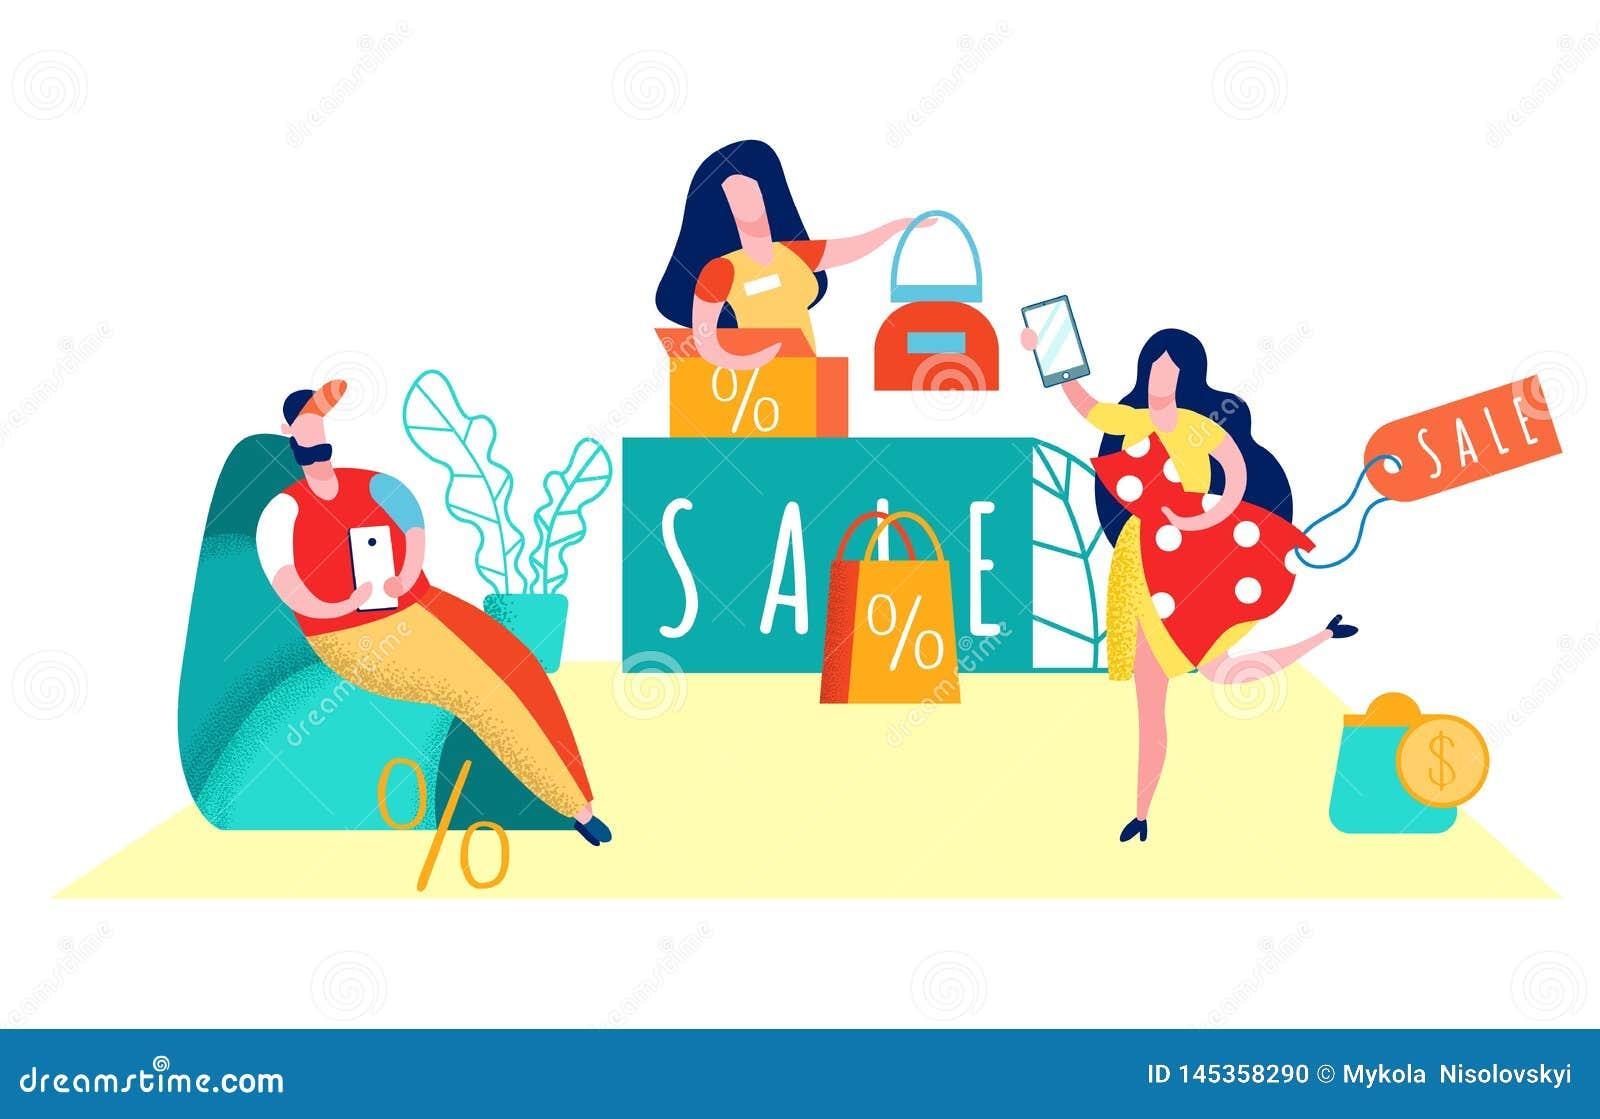 Consumerism, Shopaholism Flat Vector Illustration